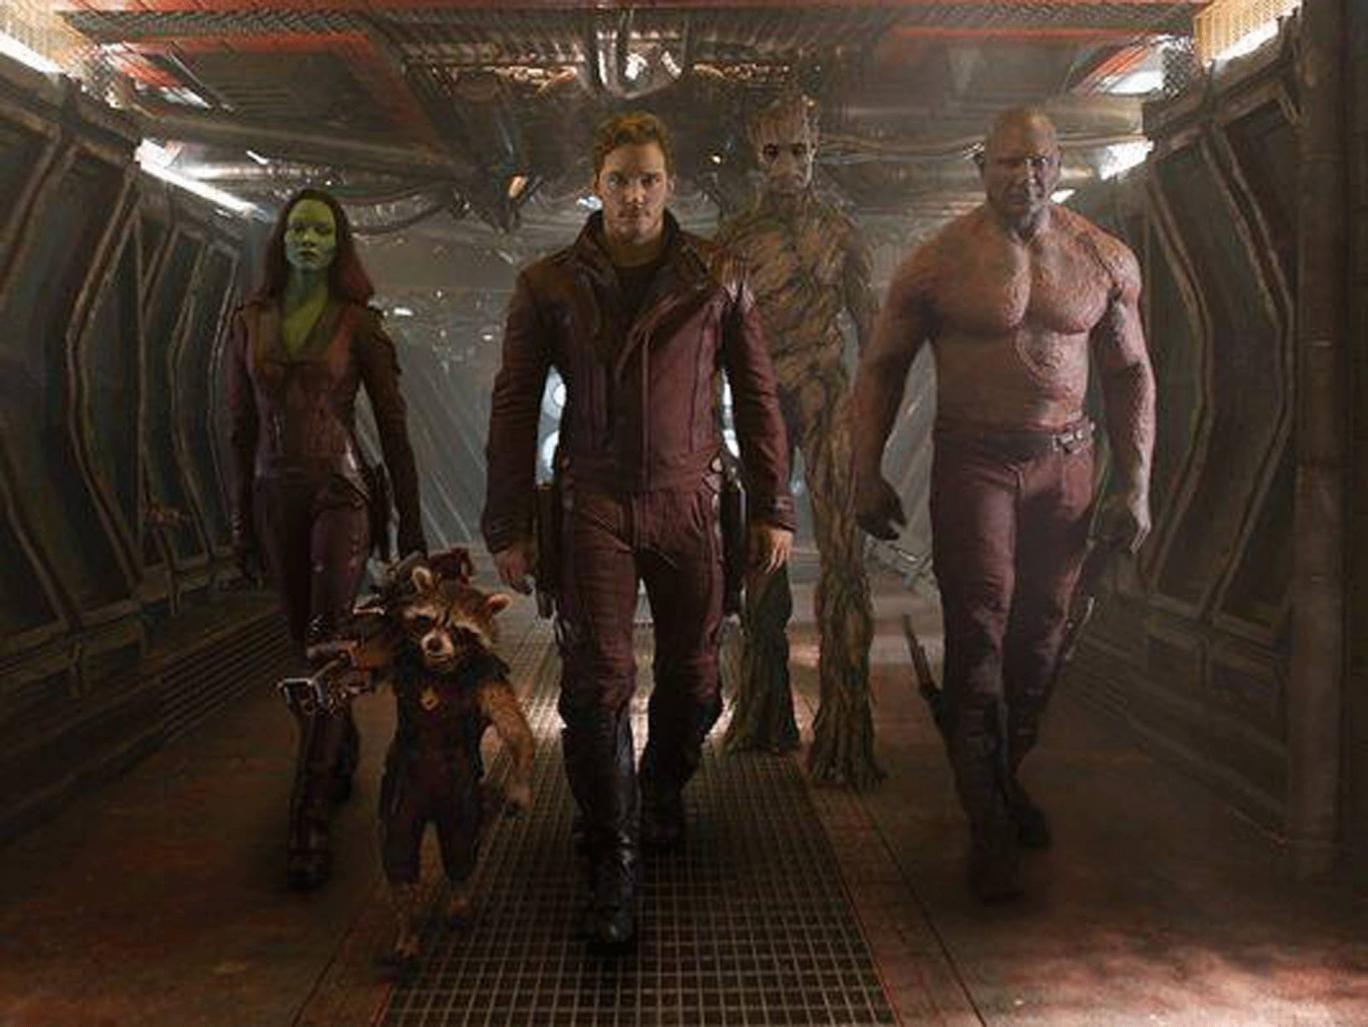 Chris Pratt stars in Guardians of the Galaxy